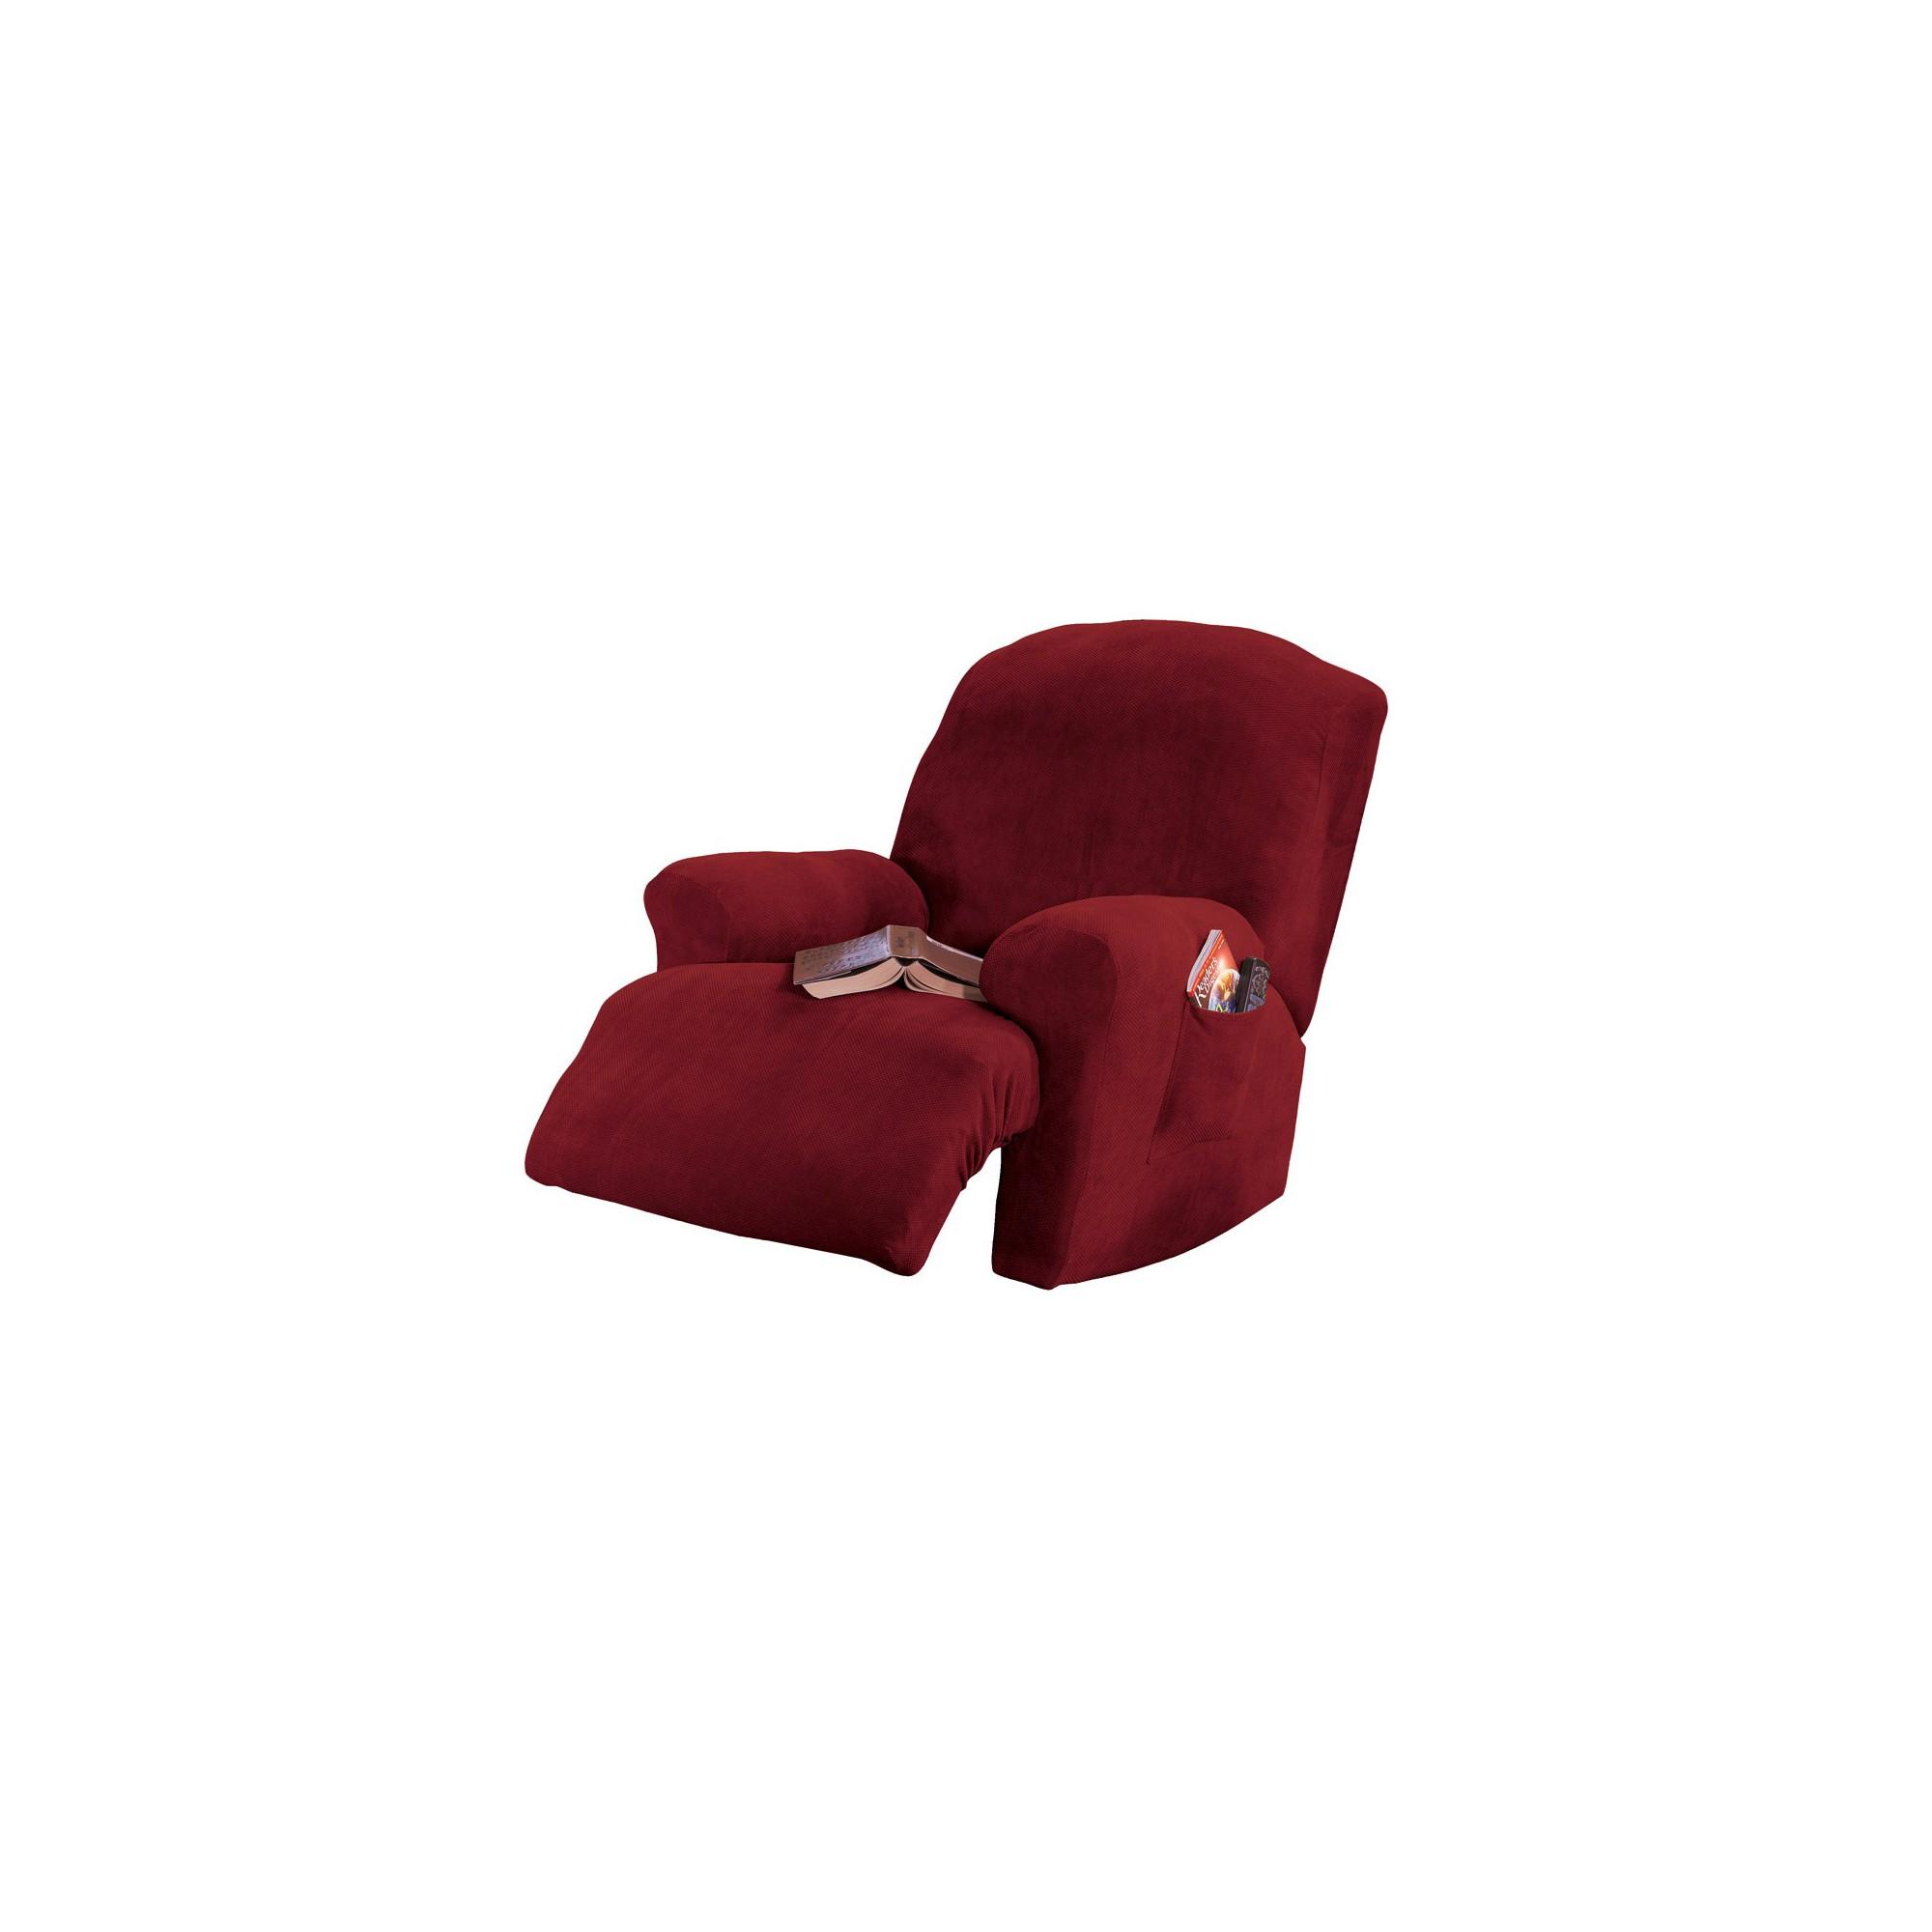 Garnet Stretch Pique Recliner Slip - Sure Fit, Red